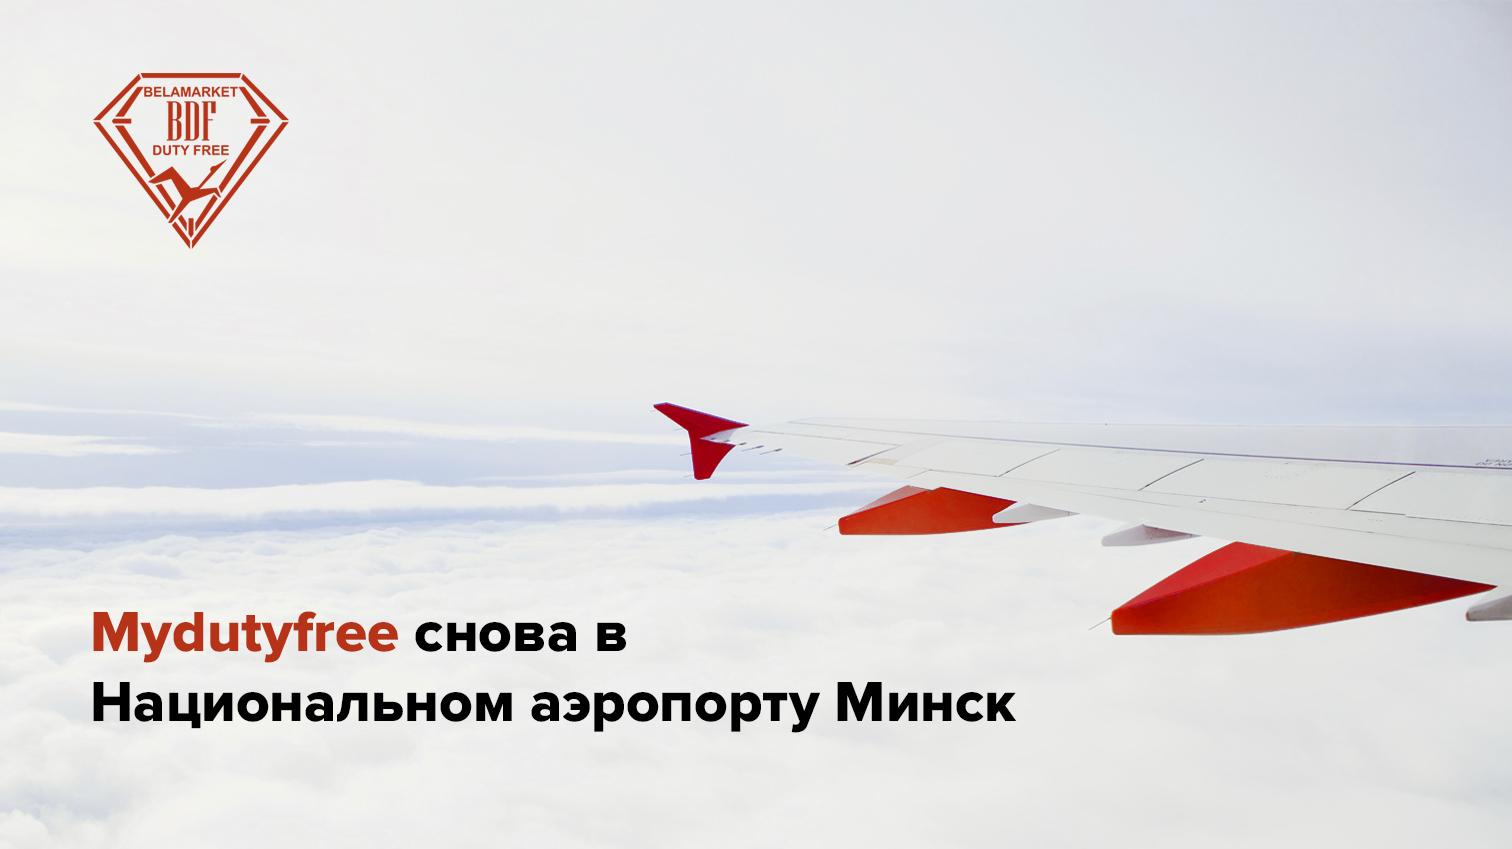 Mydutyfree Minsk